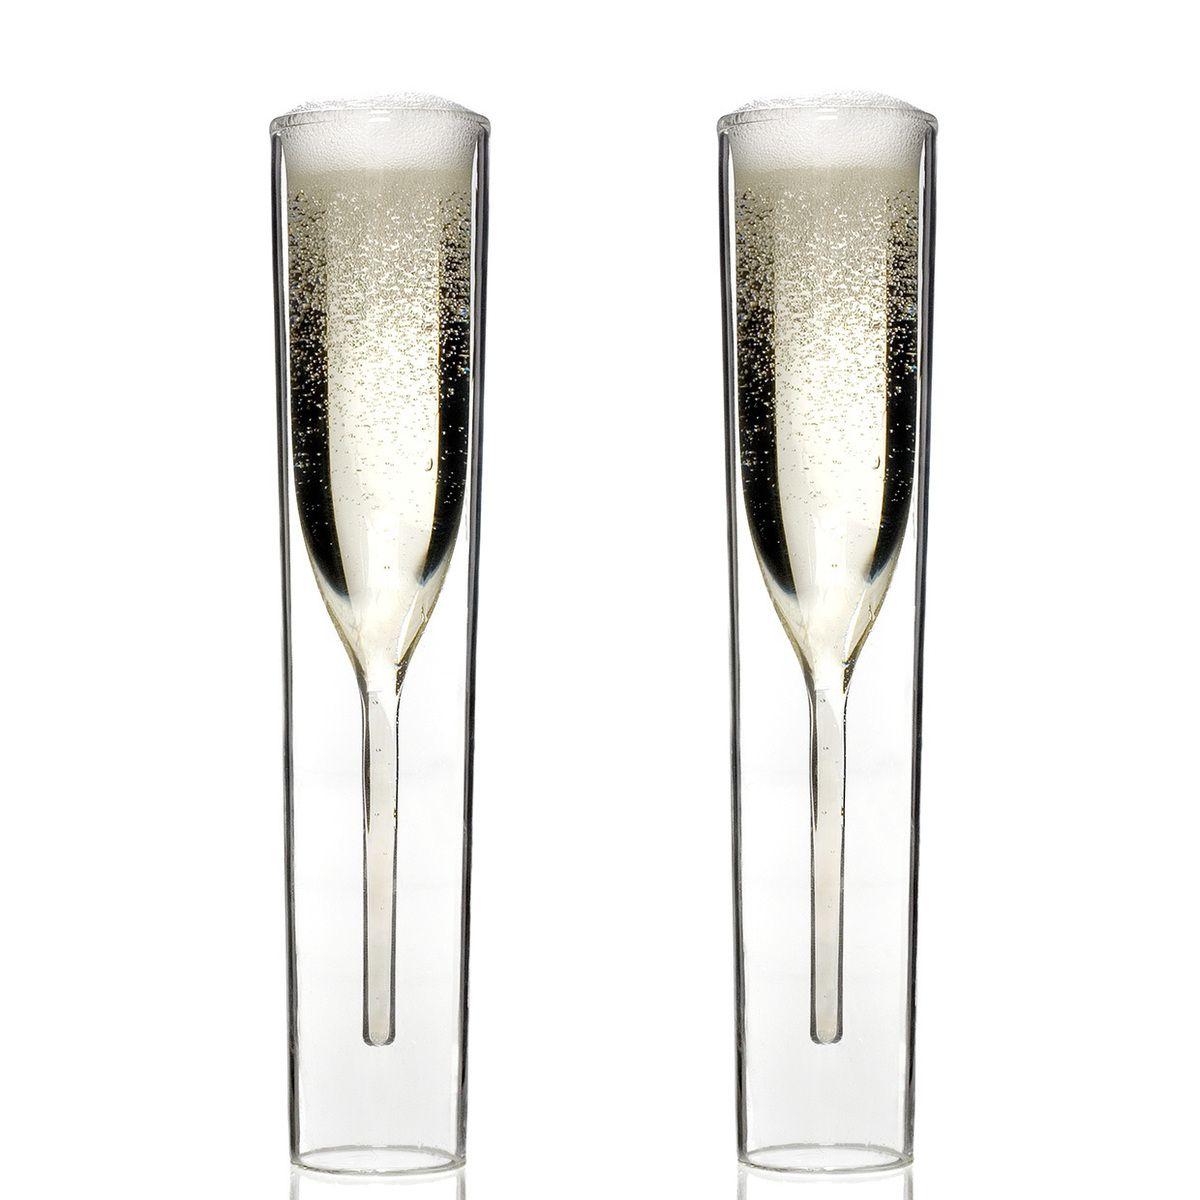 Glasses Glass Set Contemporary Champagne Flutes Champagne